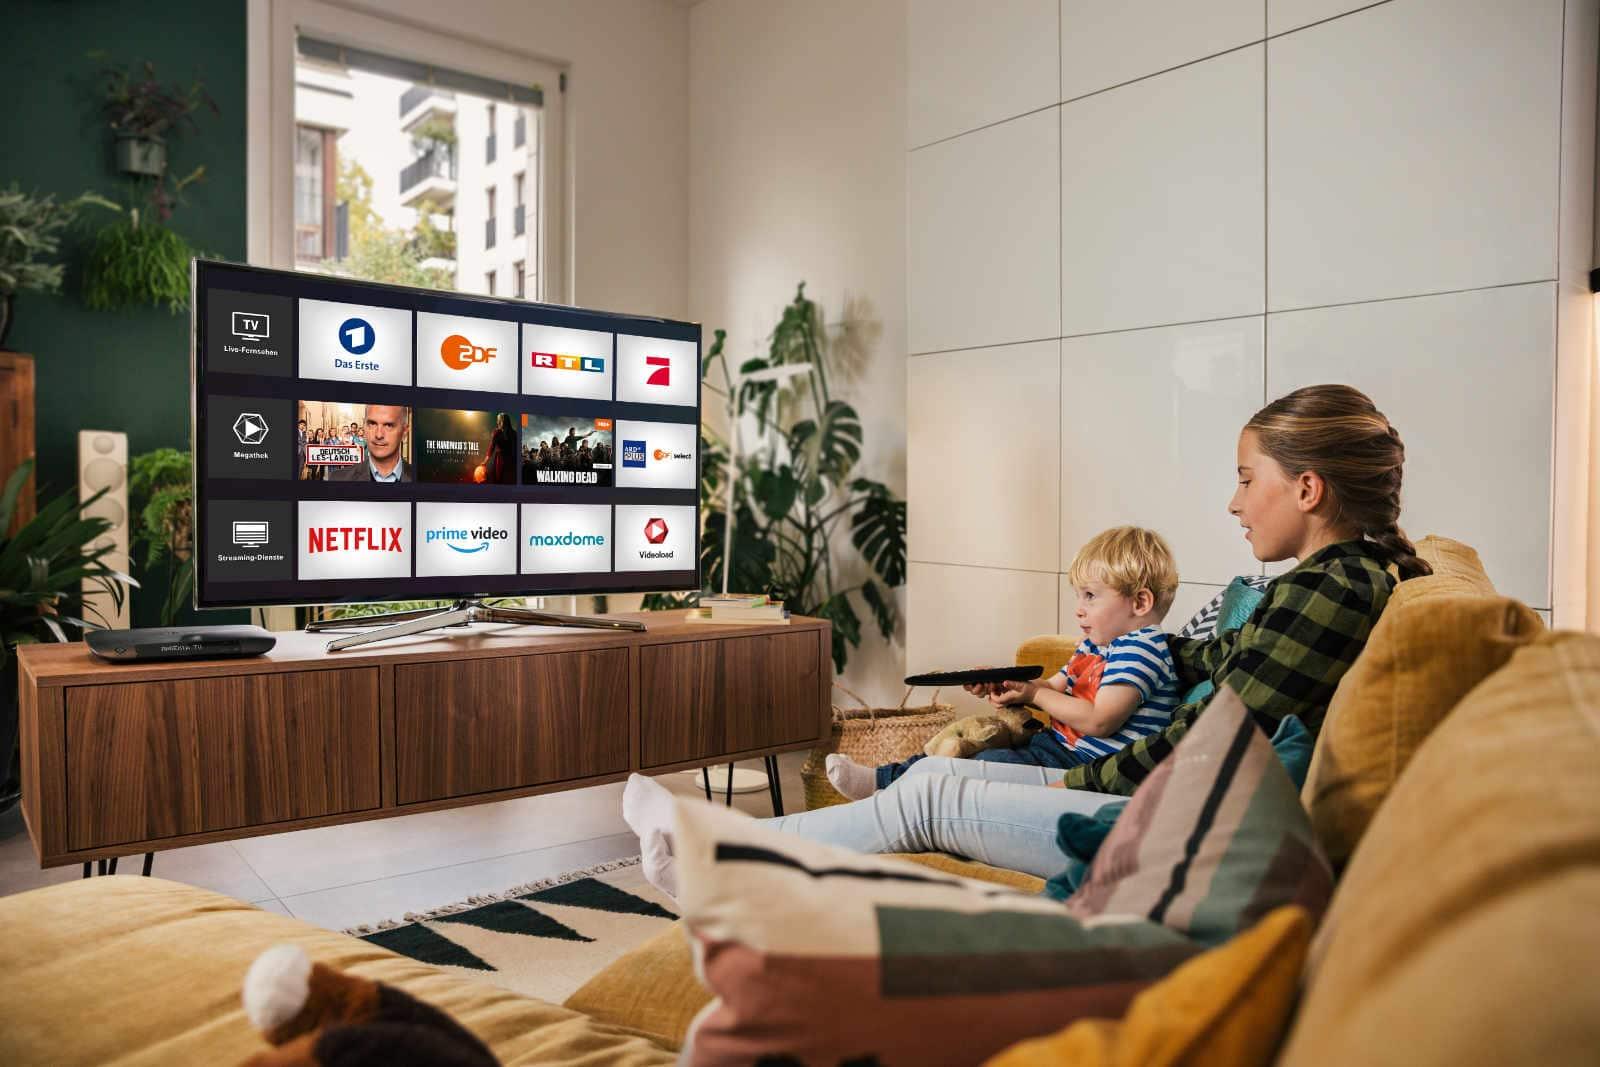 Netflix Bei Magentatv